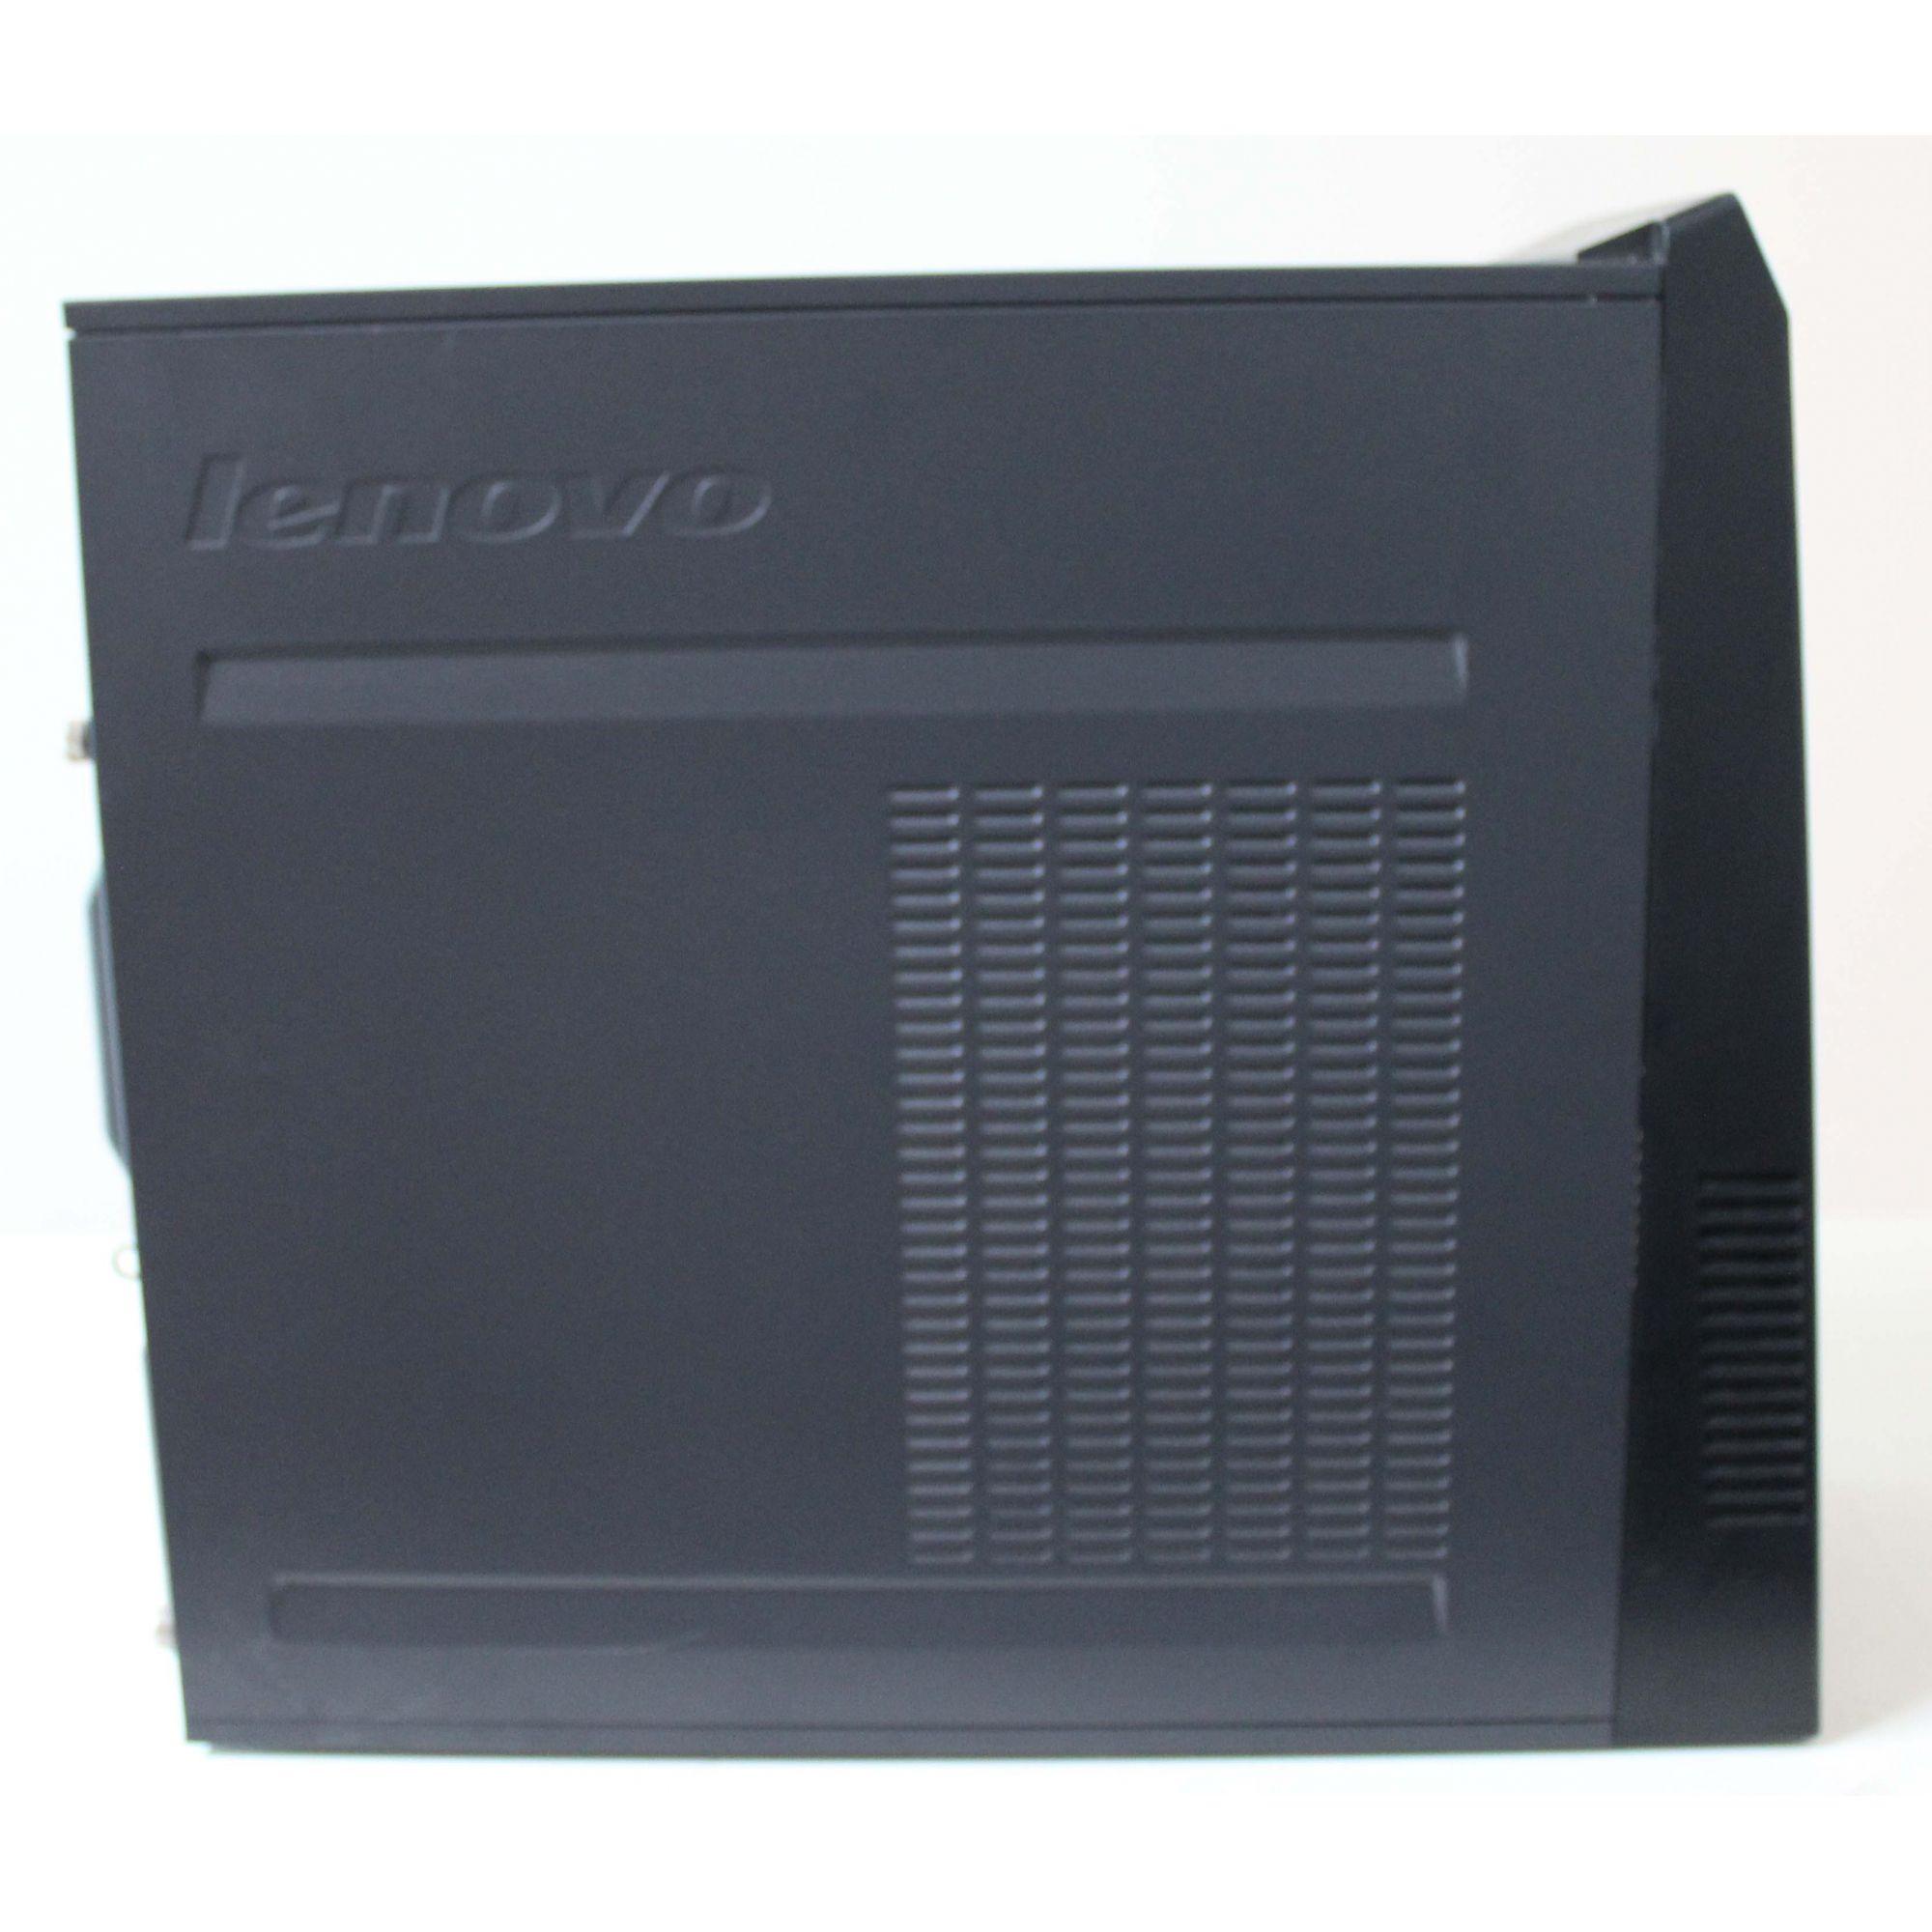 Computador Lenovo 63 Intel Core i3 3.6GHz 8GB HD-500GB